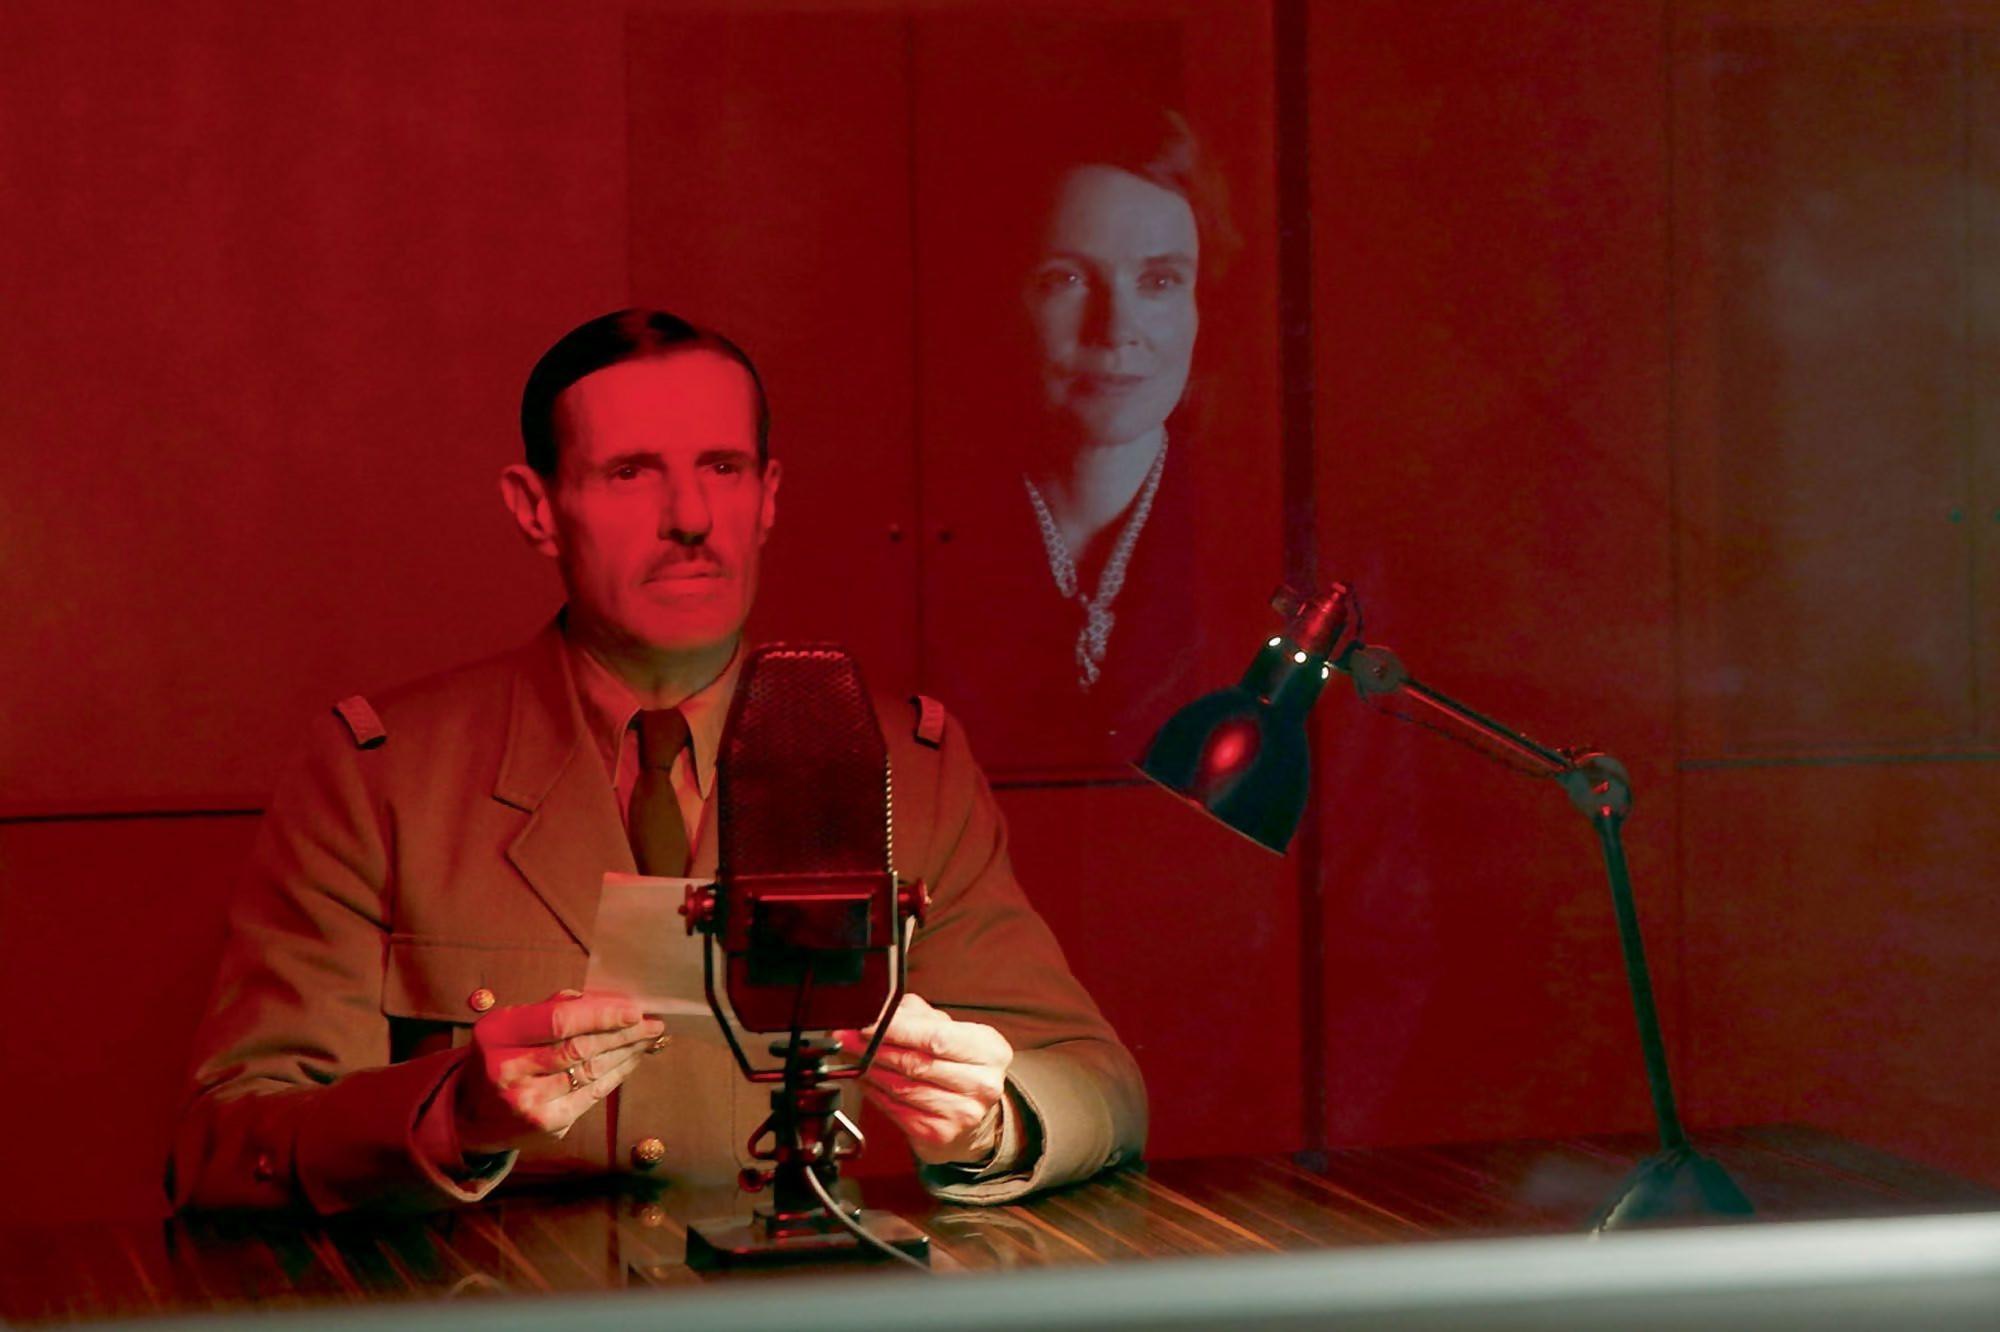 De Gaulle — Alliance Française French Film Festival 2021